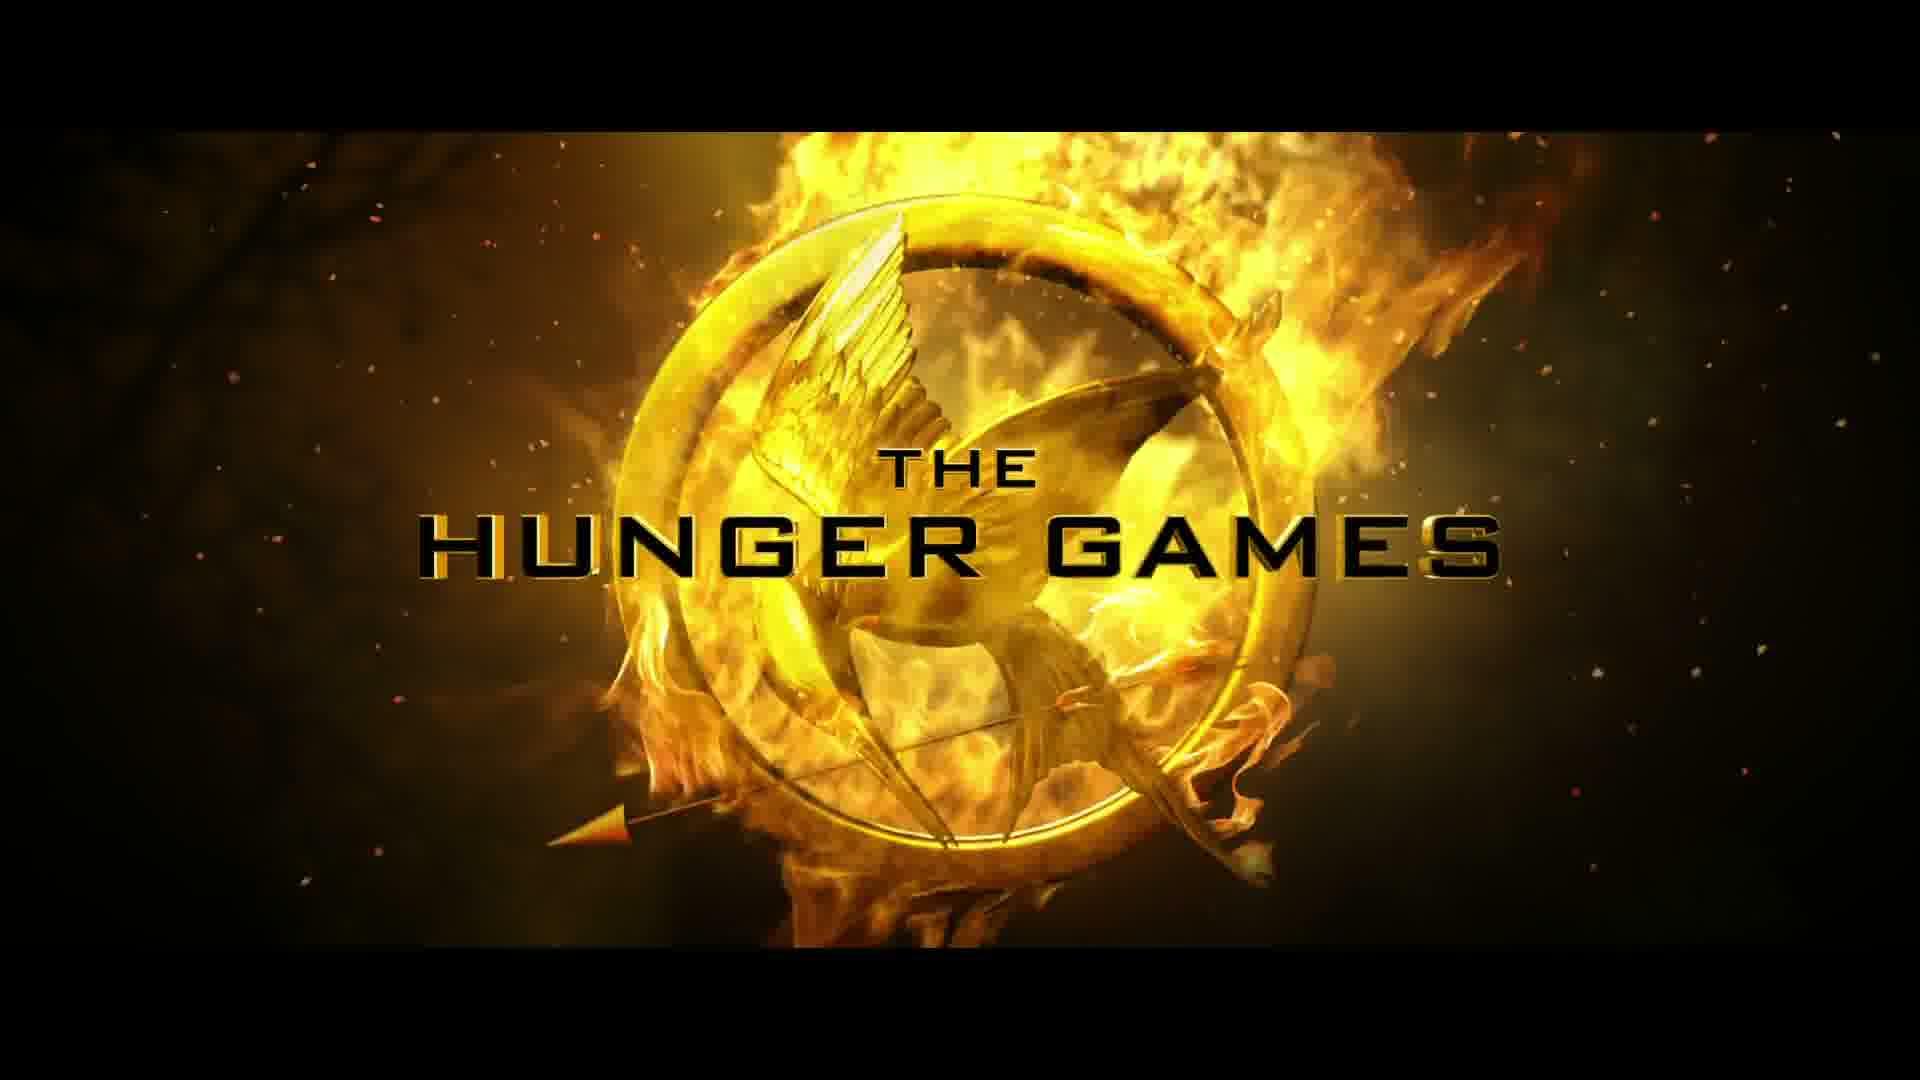 Hunger Games Wallpaper HD For Desktop 1920x1080